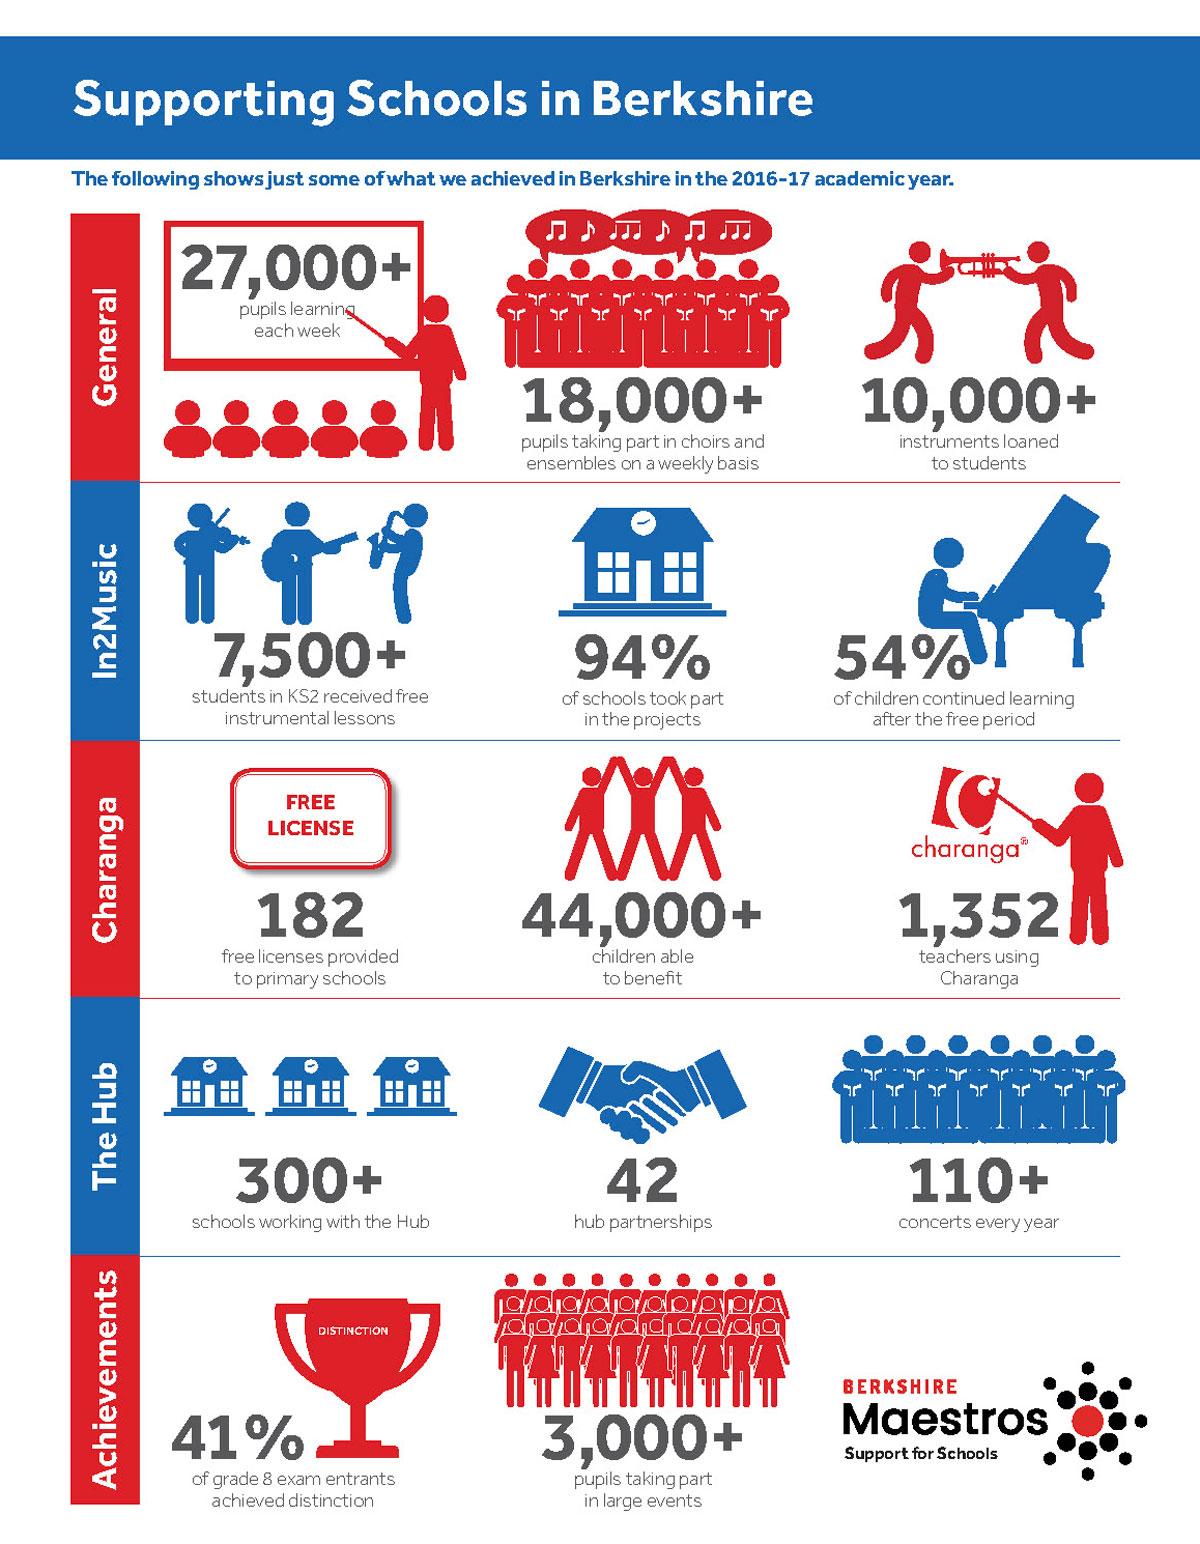 Berkshire_Maestros_infographic